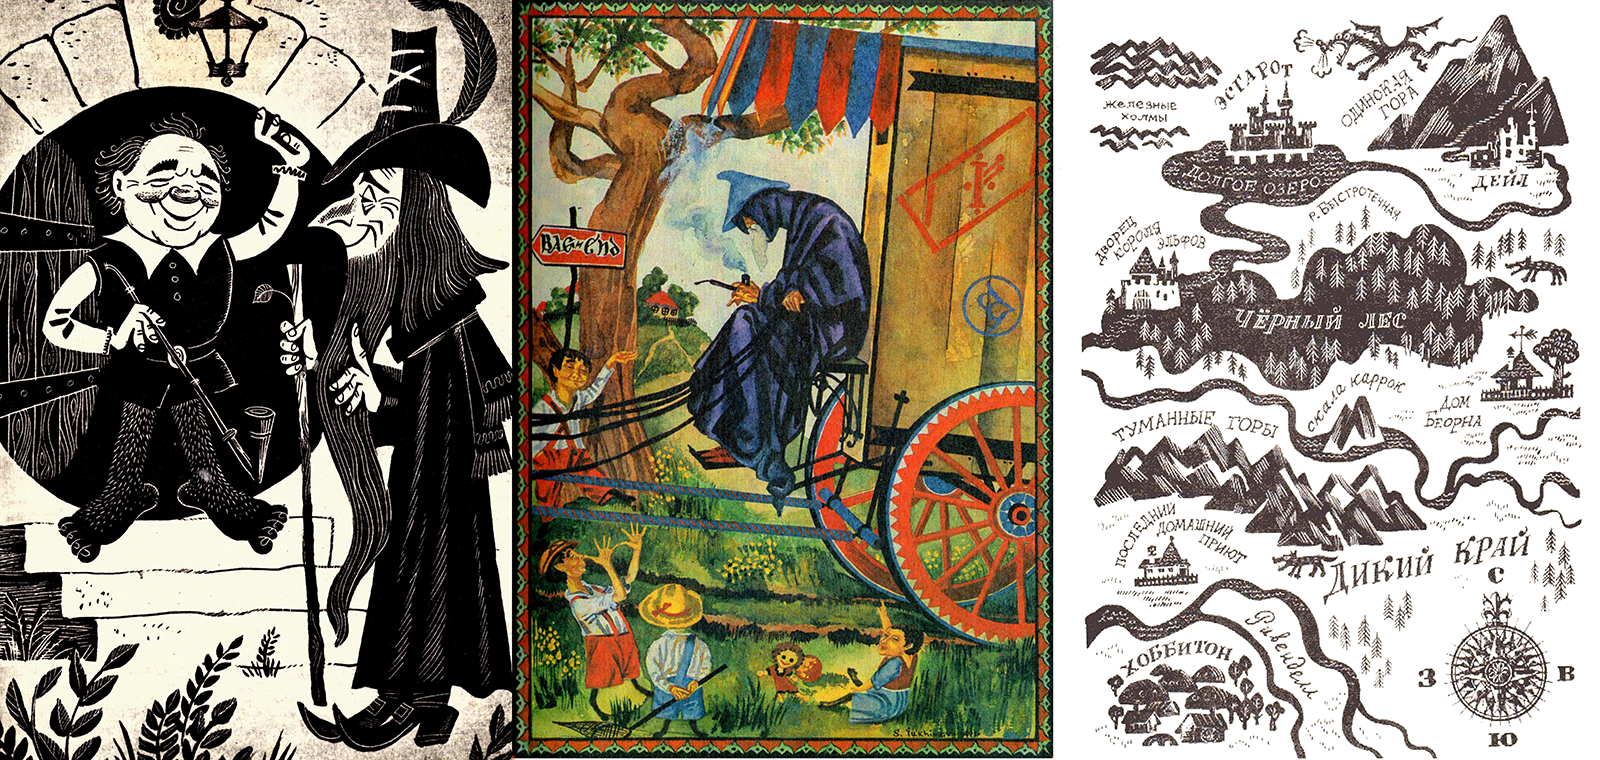 Assorted Soviet Tolkien illustrations (from left to right): Bilbo and Gandalf meet, by Mikhail Belomlinsky from <em>Khobbit</em> (1976) translated by Natalia Rakhmanova; Gandalf arrives in Hobbiton by Sergei Iukhimov from <em>Vlastelin Kolec</em> Volume I (1993); Wilderland/Thror's Map amalgam by Mikhail Belomlinsky from <em>Khobbit</em> (1976).